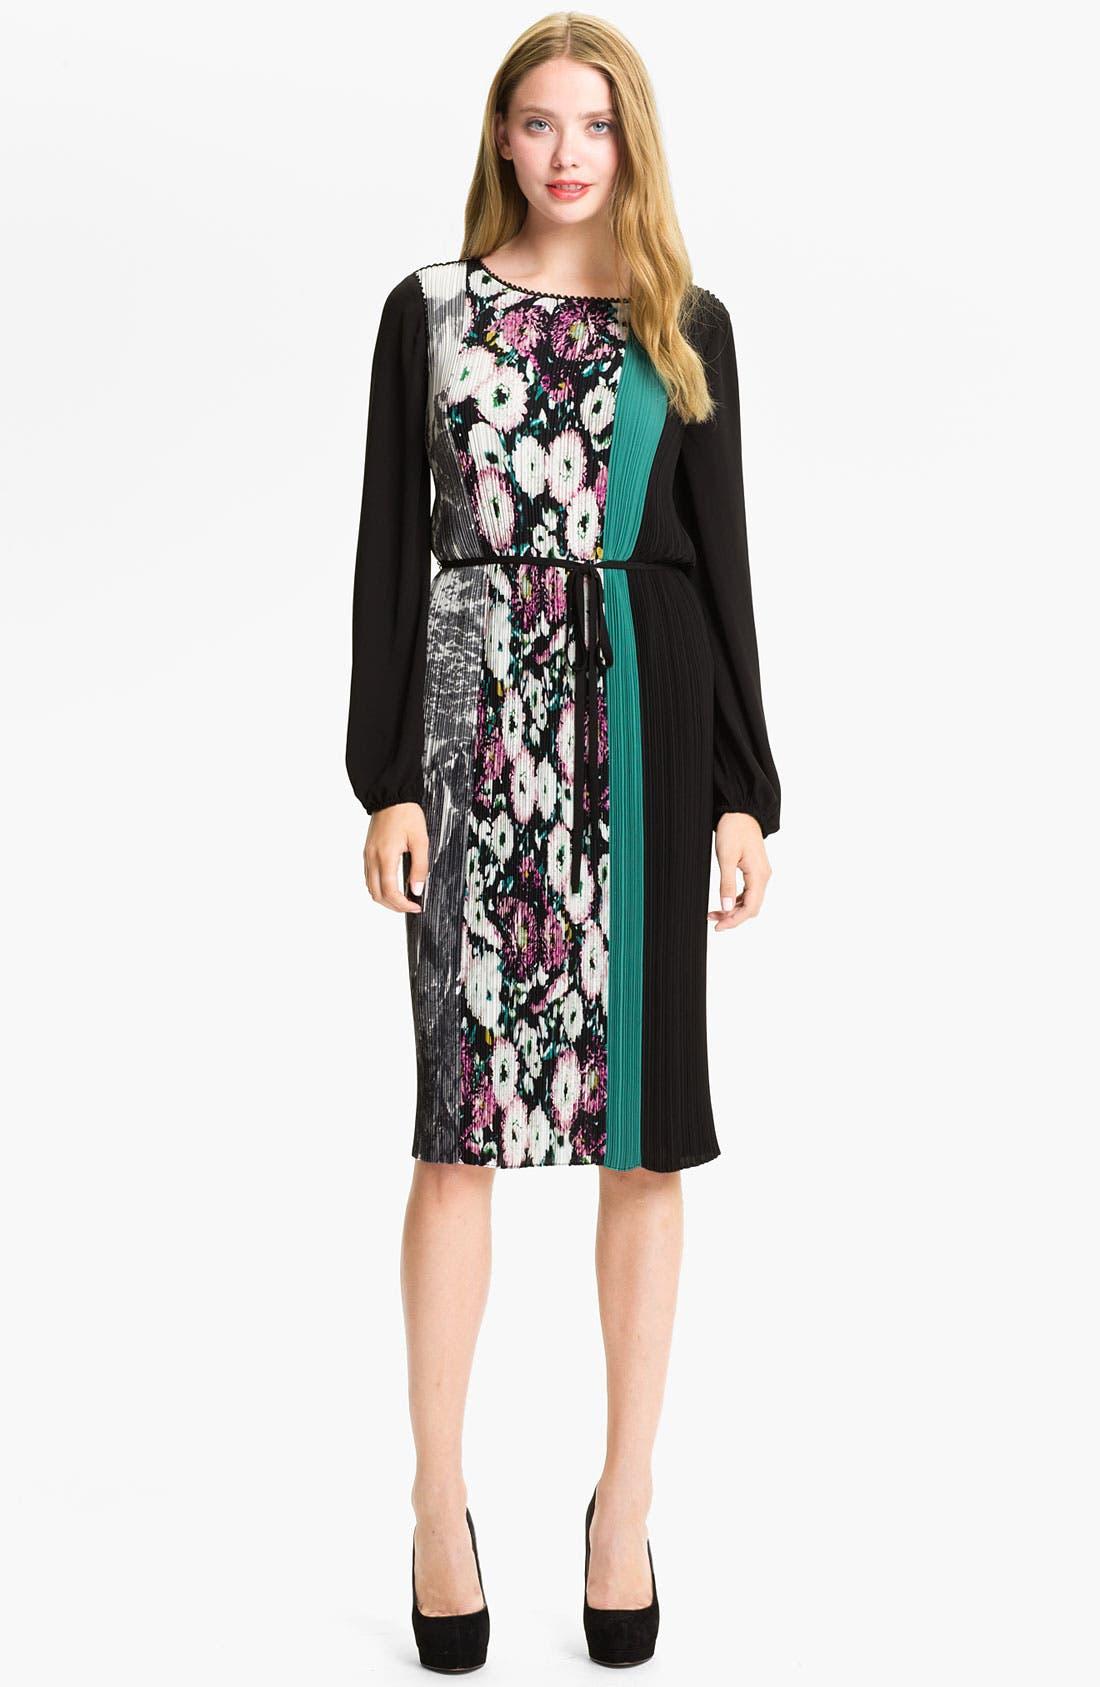 Alternate Image 1 Selected - BCBGMAXAZRIA Mixed Print Pleated Blouson Dress